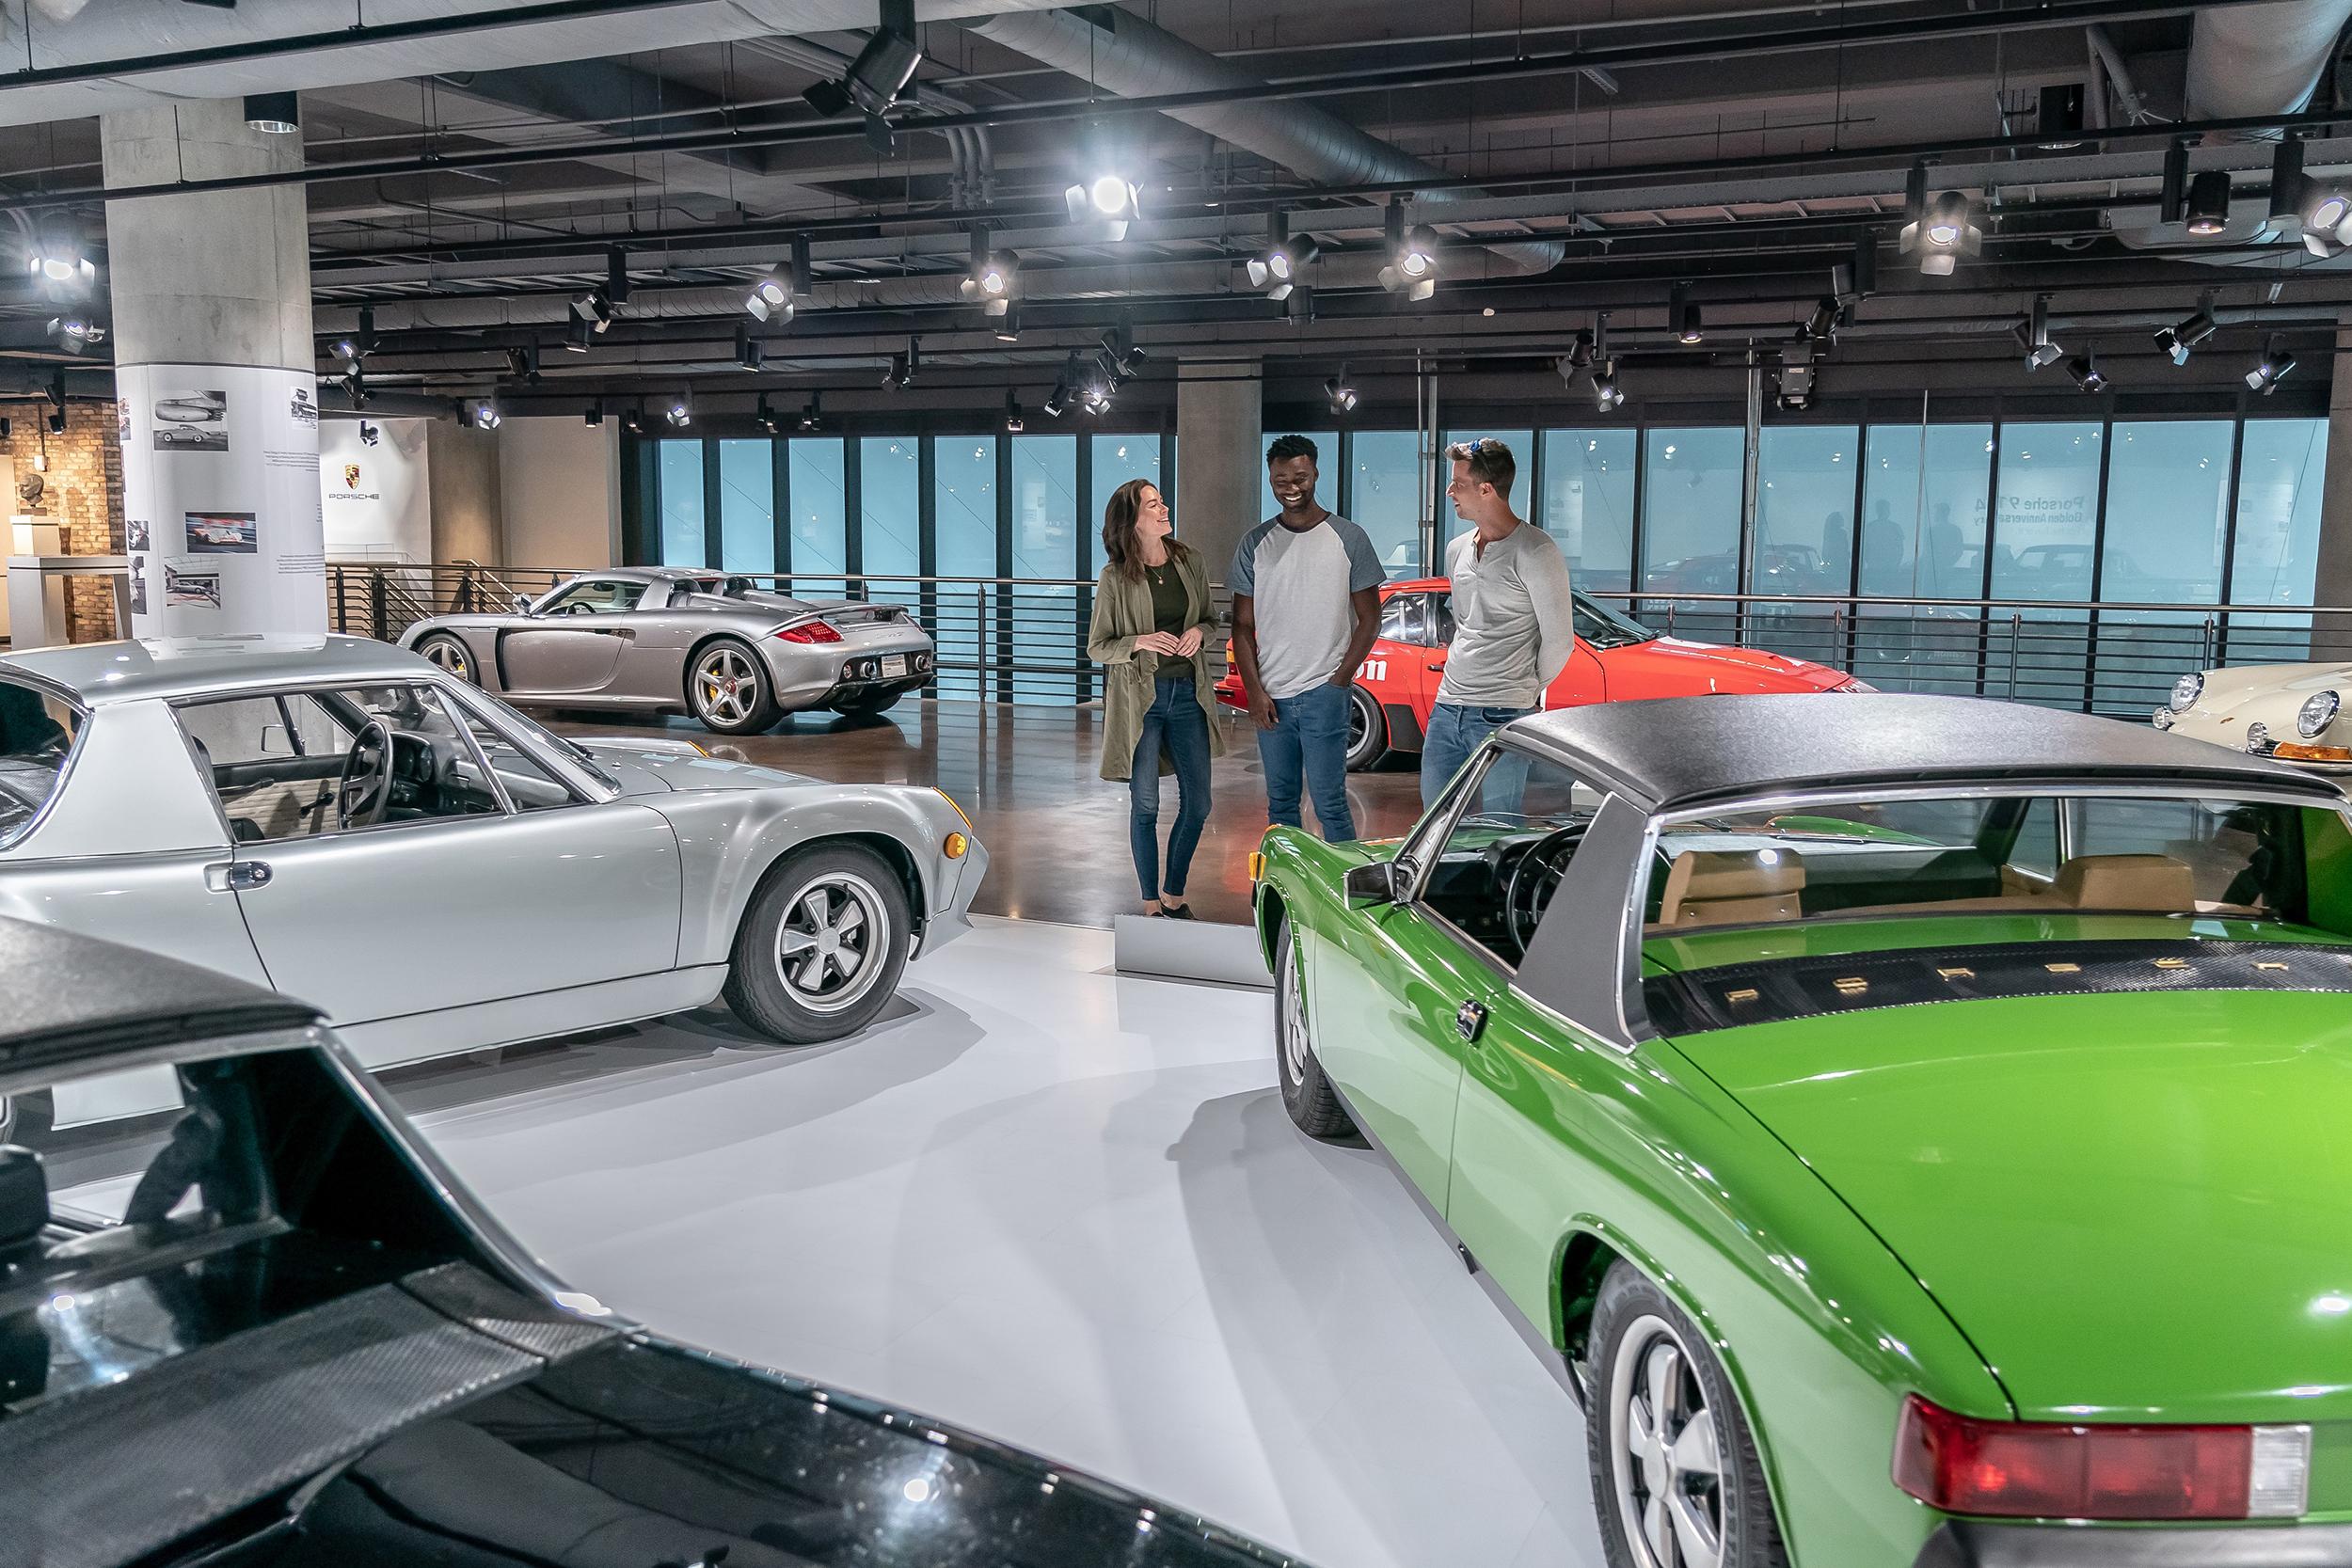 201208 Porsche celebrates fifth anniversary of its U.S. home at the Porsche Experience Center Atlanta (3)